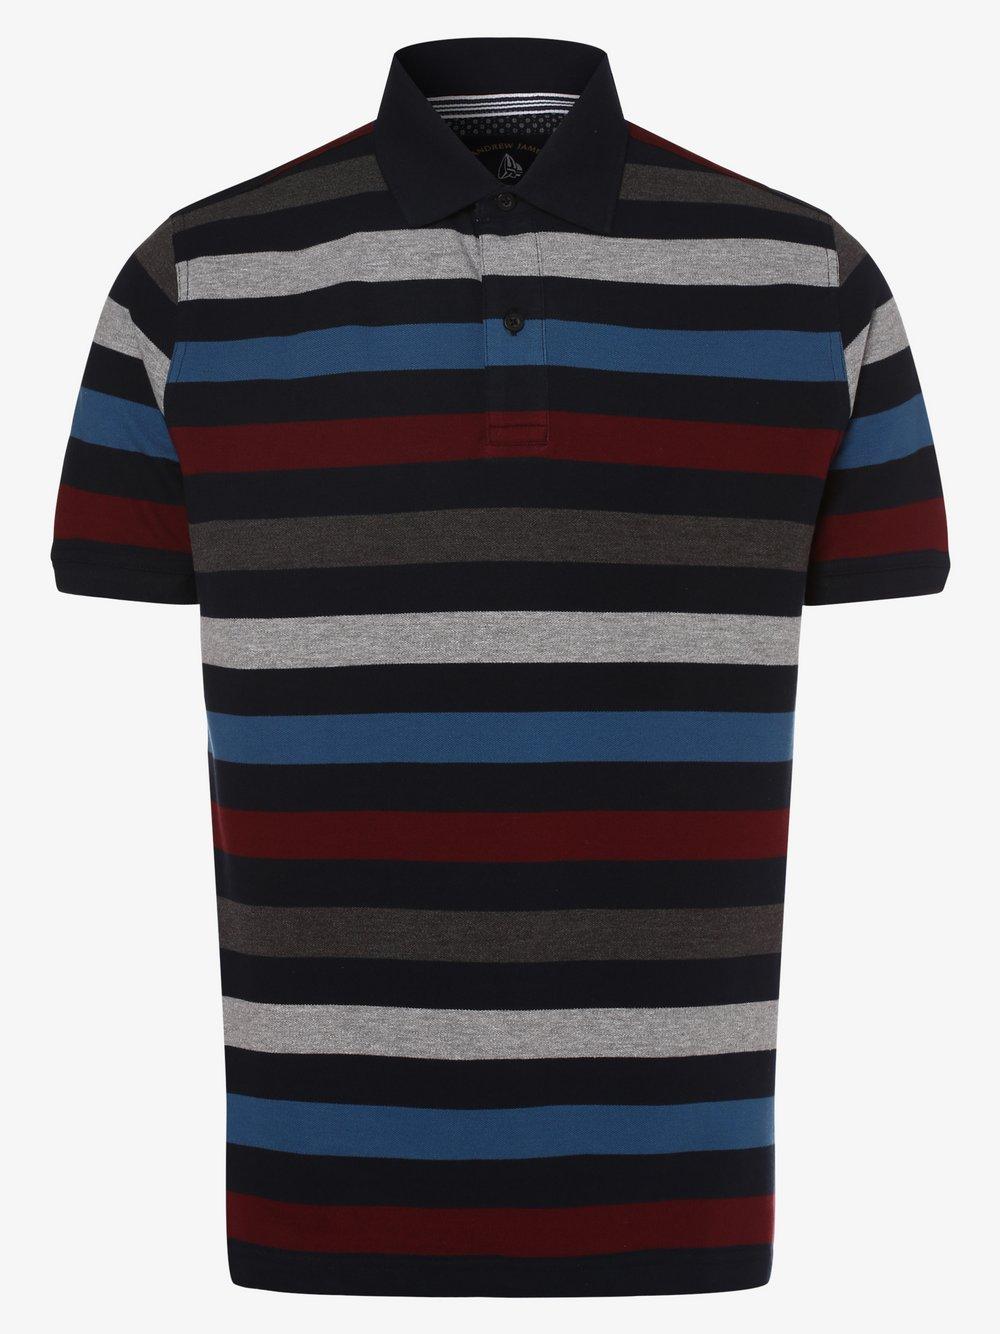 Andrew James Sailing - Męska koszulka polo, niebieski